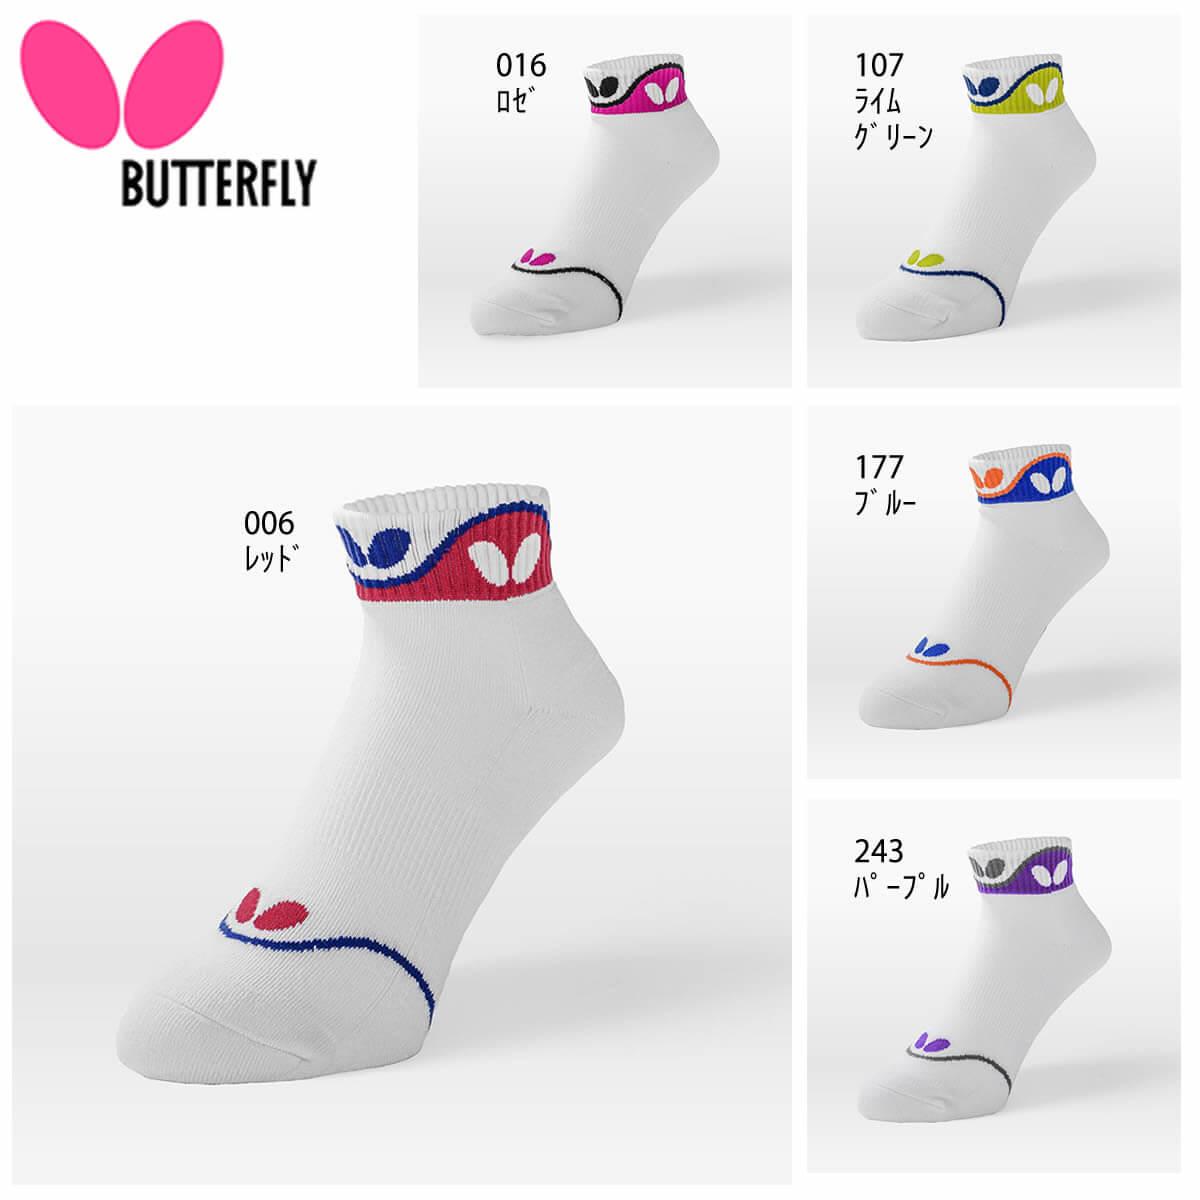 Butterfly 92290 ソックス ネストン 卓球 バタフライ 宅配便送料無料 ギフ_包装 取り寄せ メール便可 2021春夏モデル